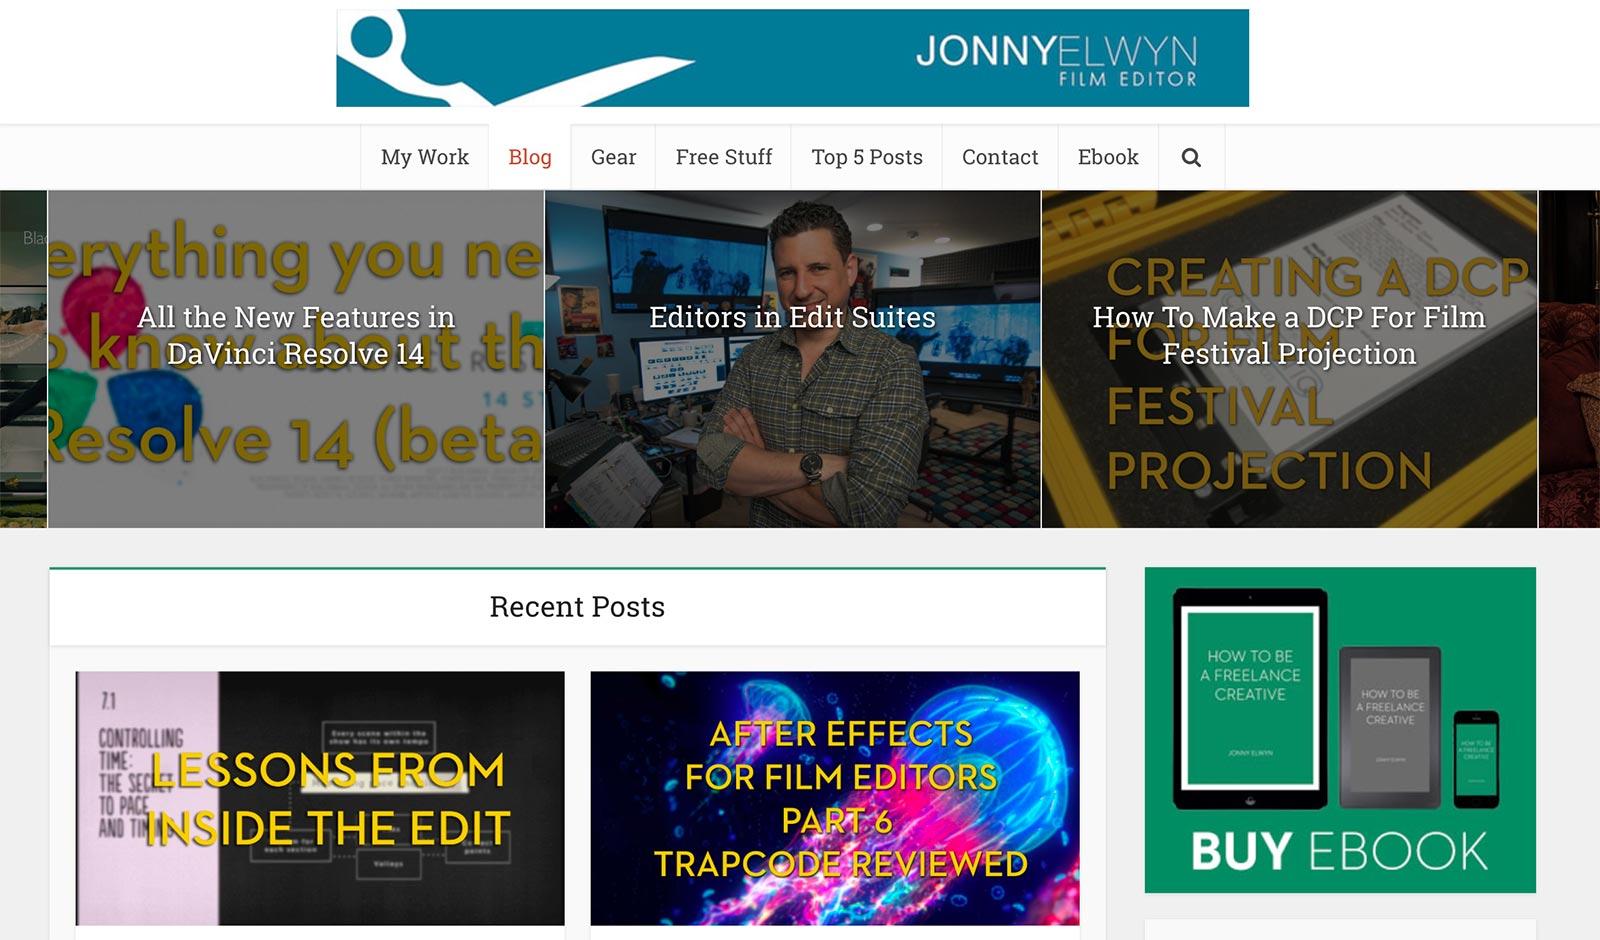 trang web jonny elwyn